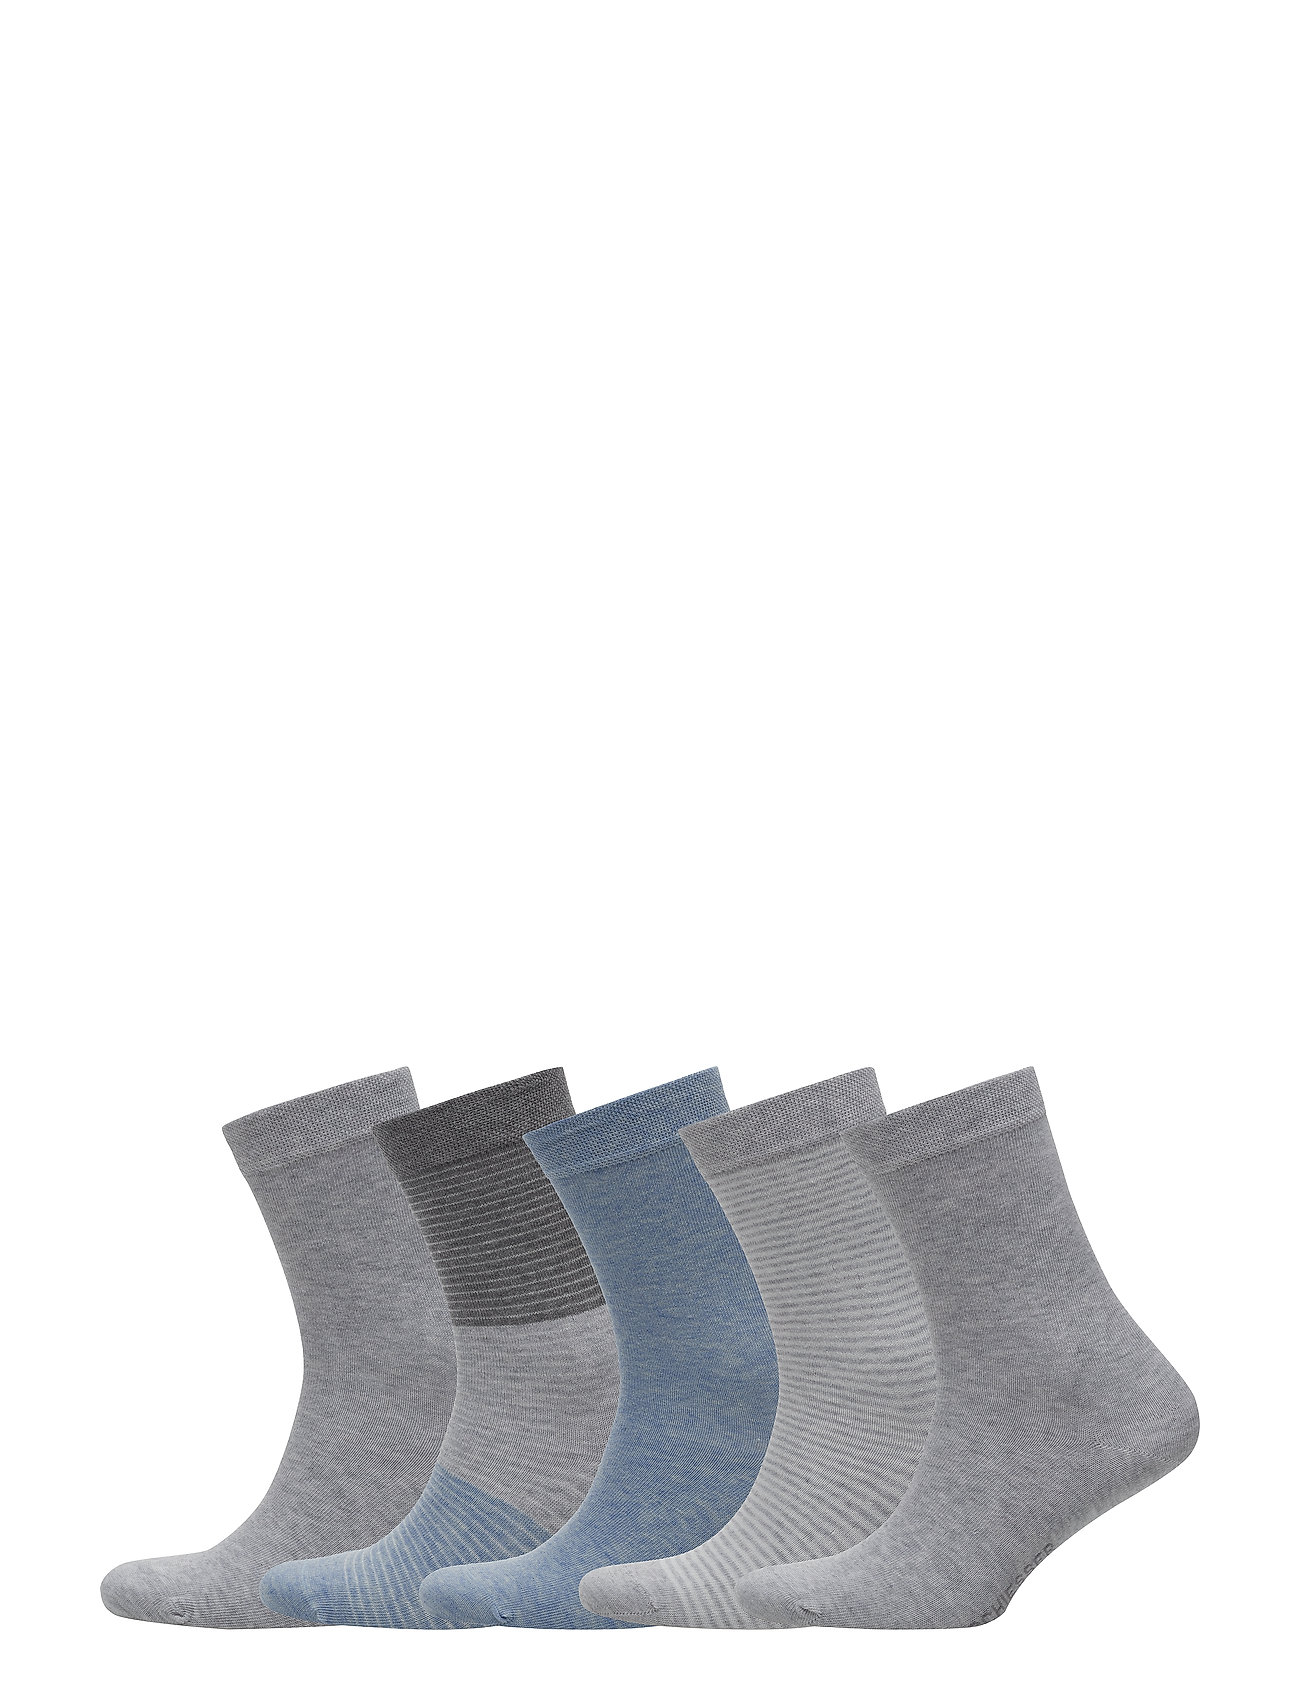 Schiesser Socks - ASSORTED 1